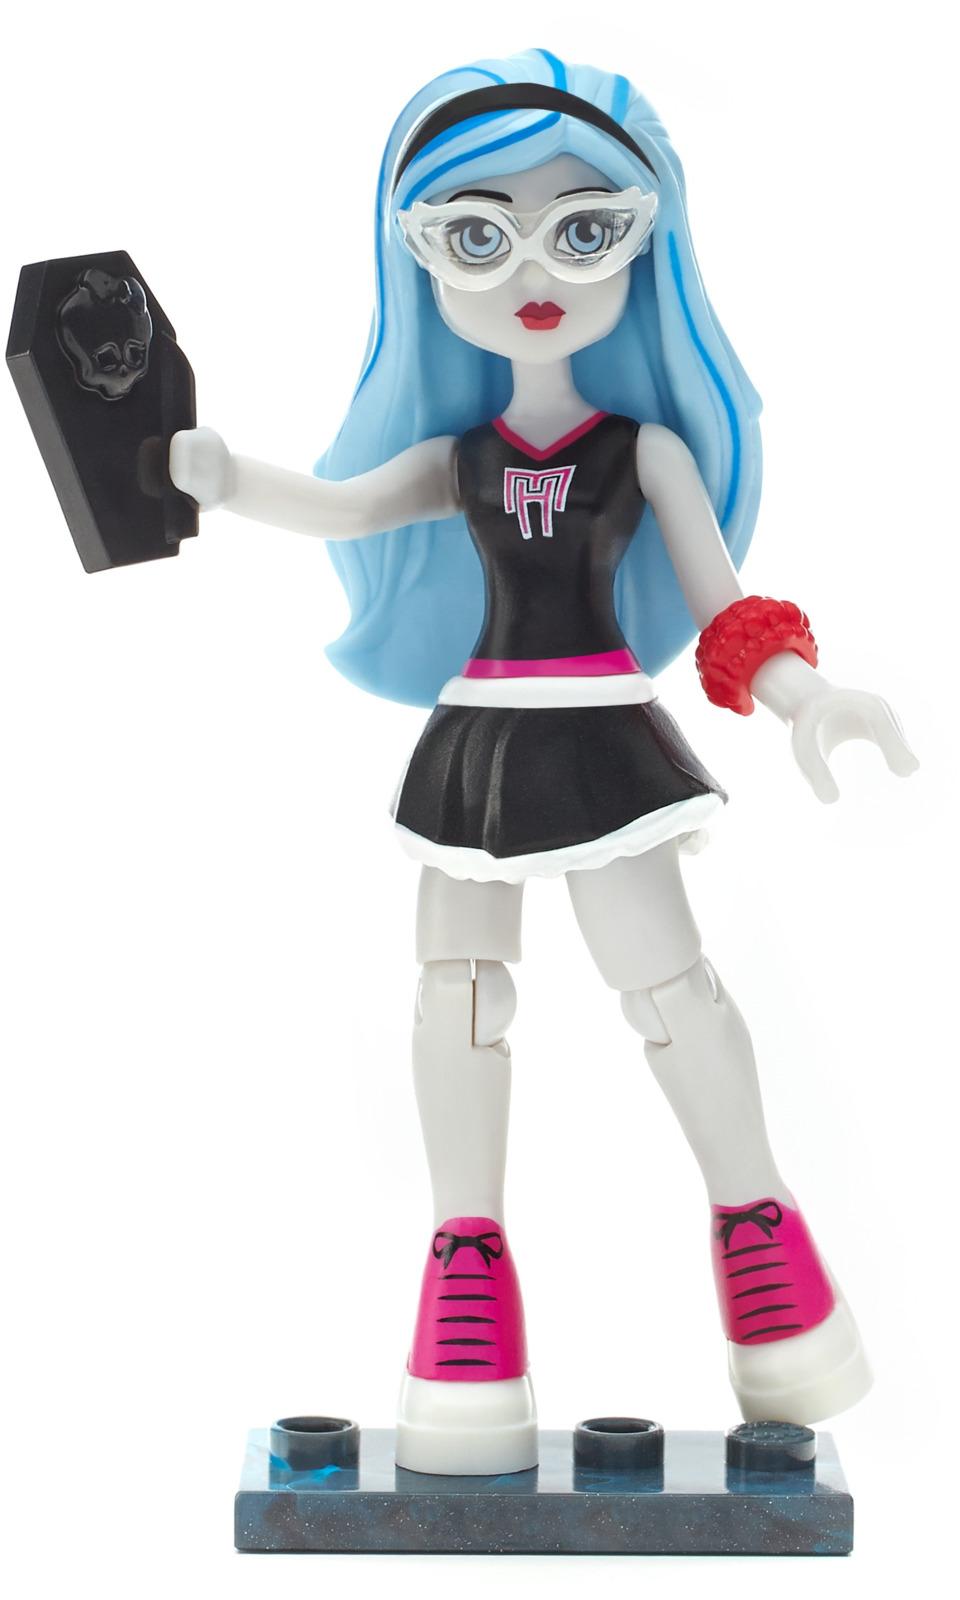 Mega Bloks Monster High Конструктор Ghoulia Yelps цена